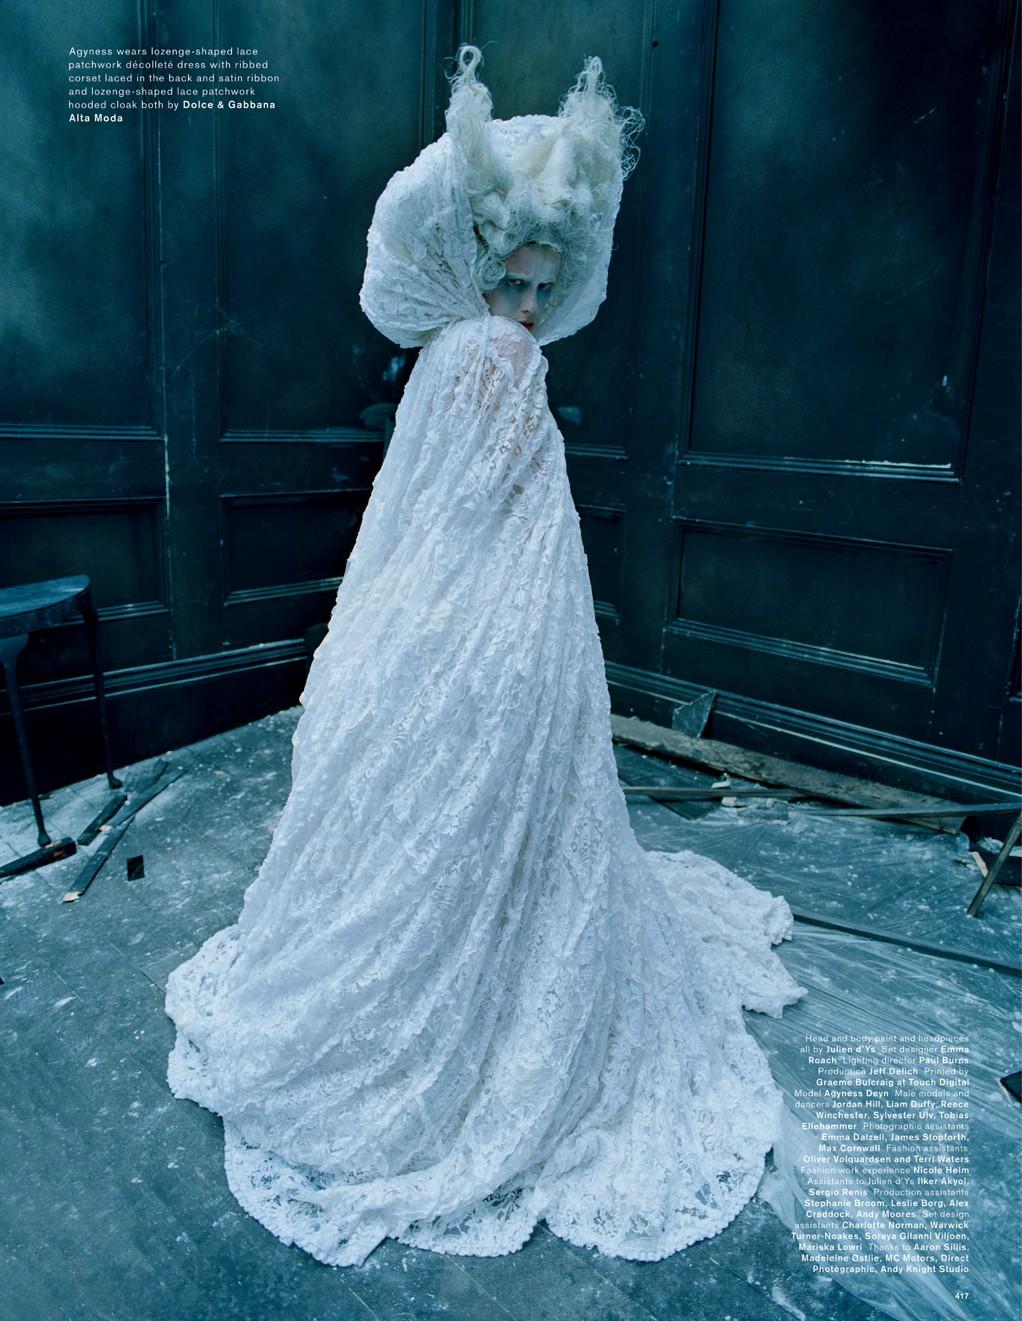 Fancy Dolce And Gabbana Wedding Dress Gallery - All Wedding Dresses ...